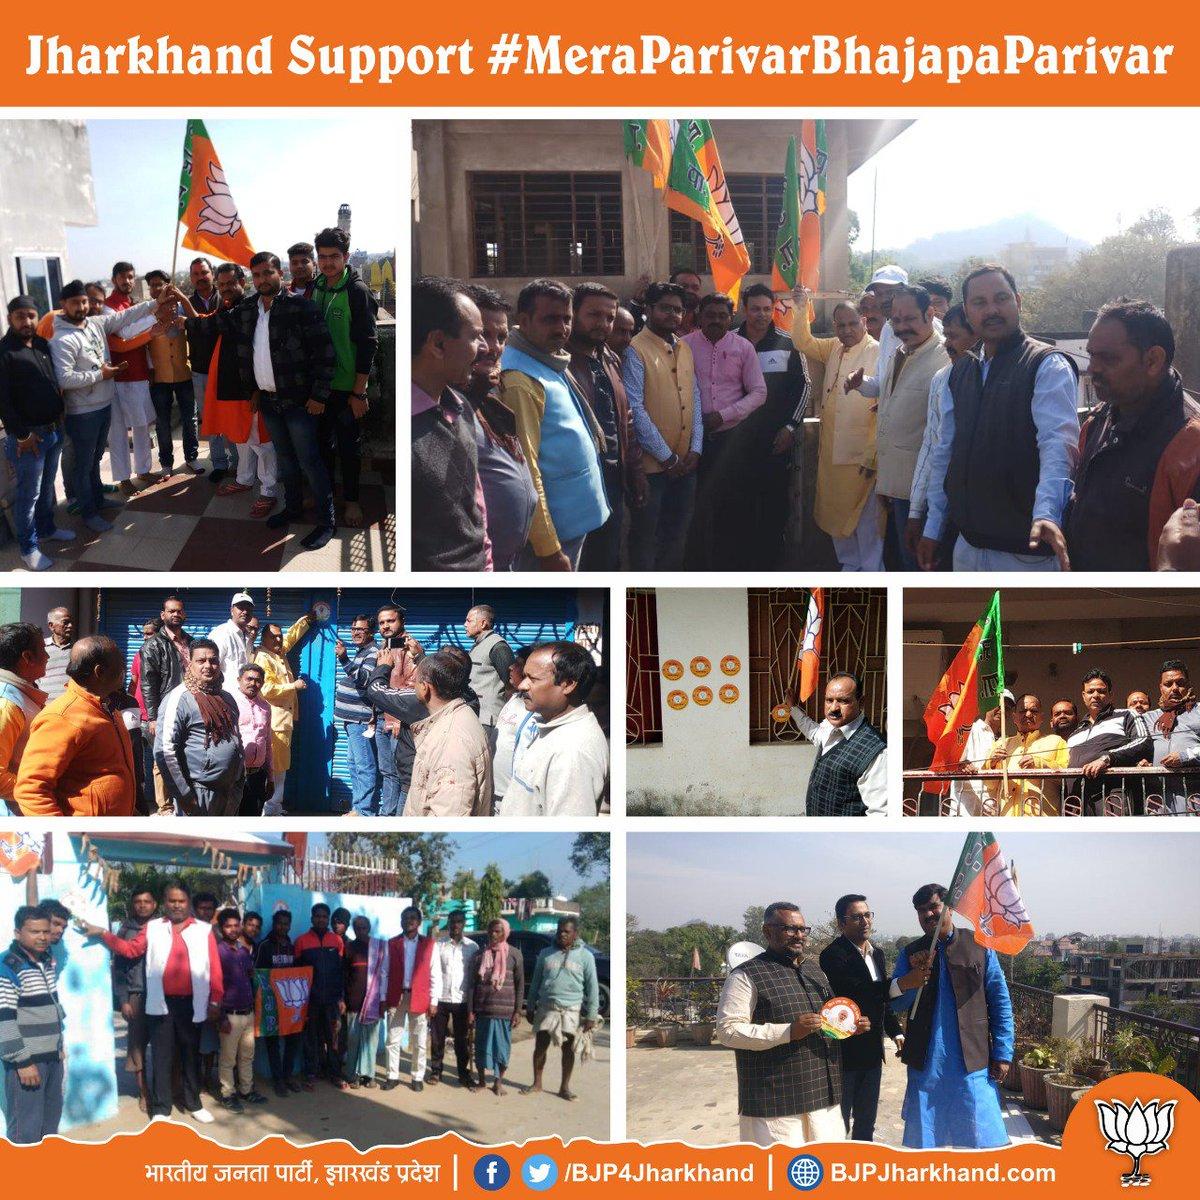 sujeet kumar's photo on #MeraParivarBhajapaParivar